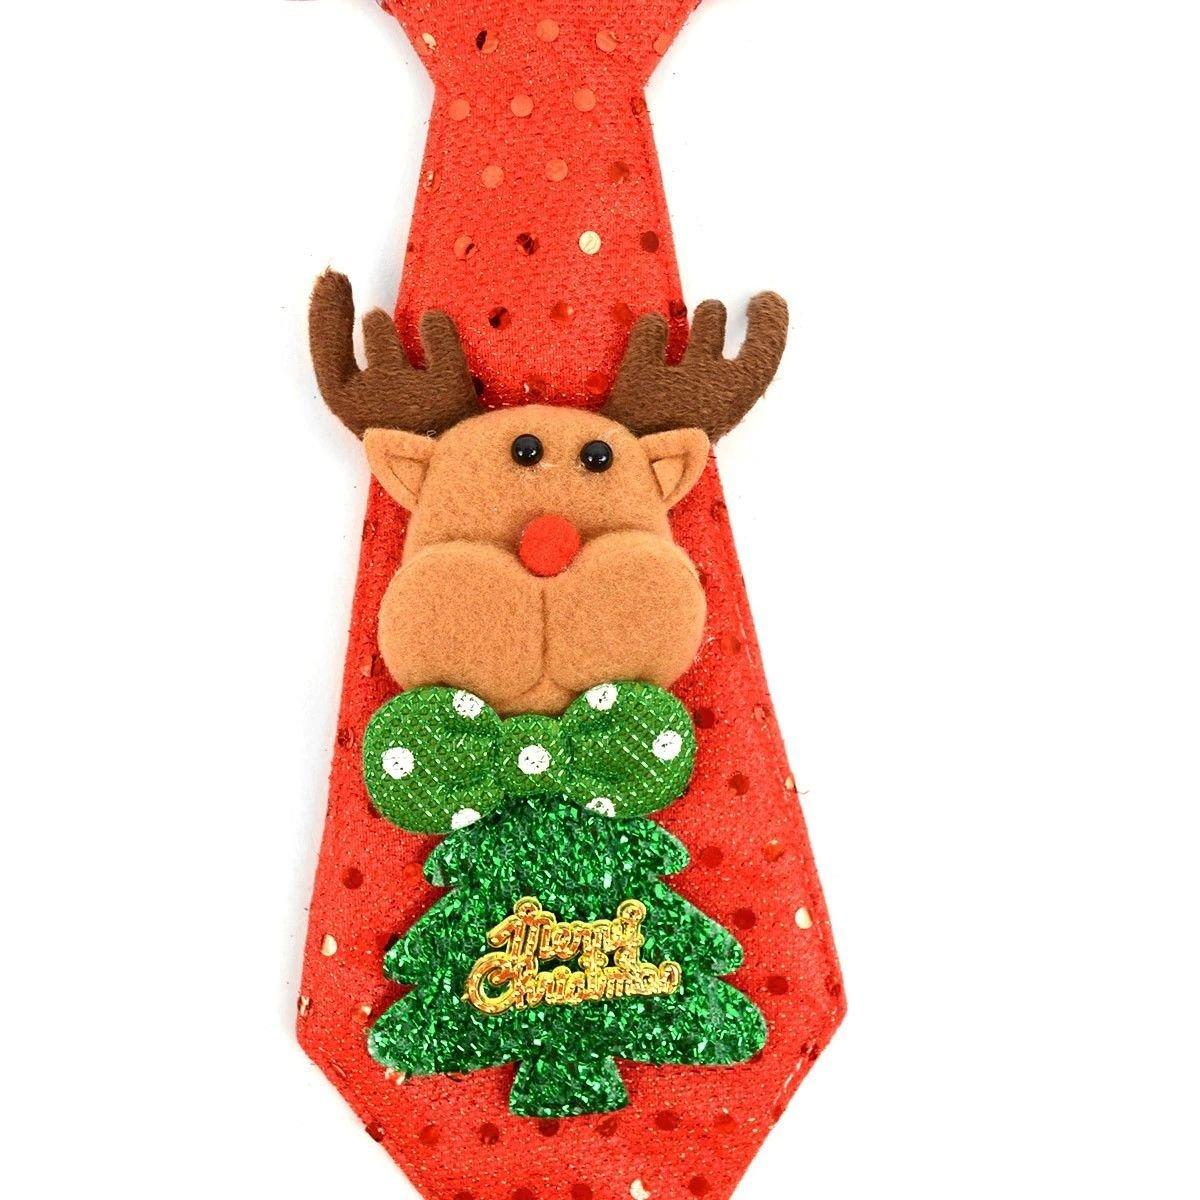 BG Holiday Christmas Light Up Neck Tie Festive Winter Accessory 5 Light Modes